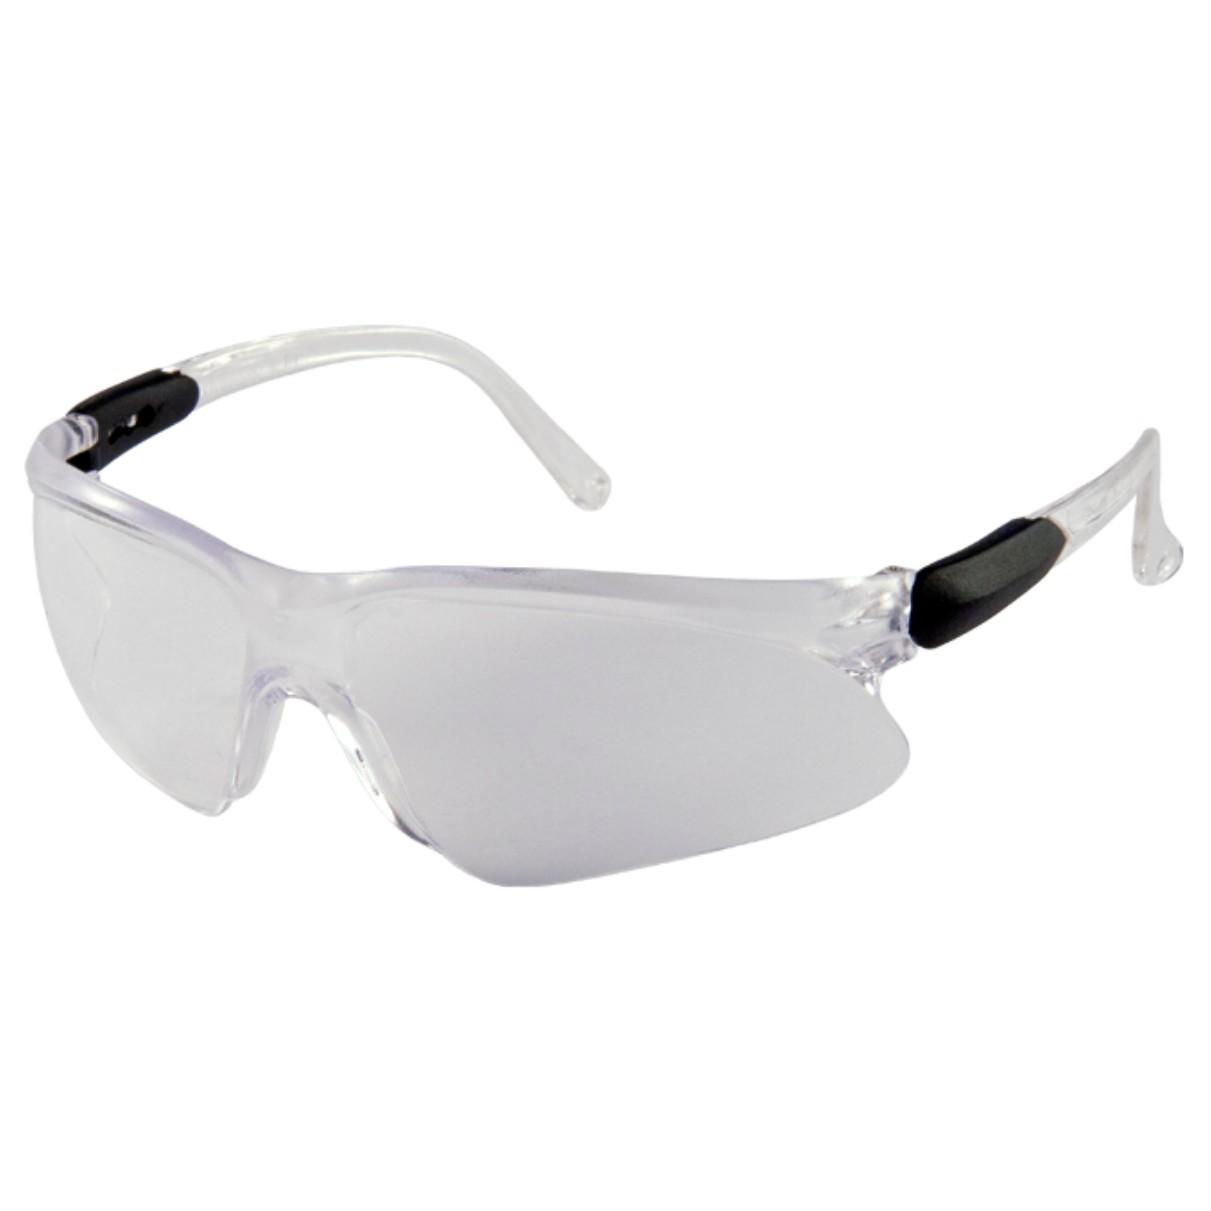 Oculos Protecao Polipropileno Lince Incolor 613 - Kalipso